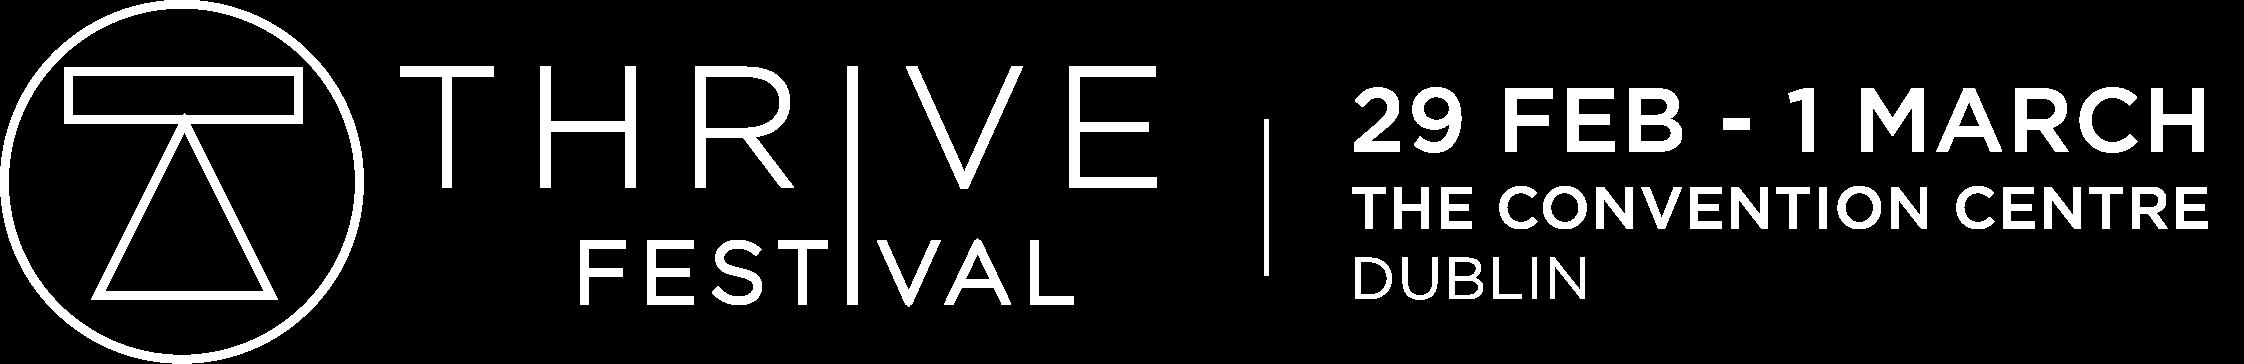 thrive festival logo 2020